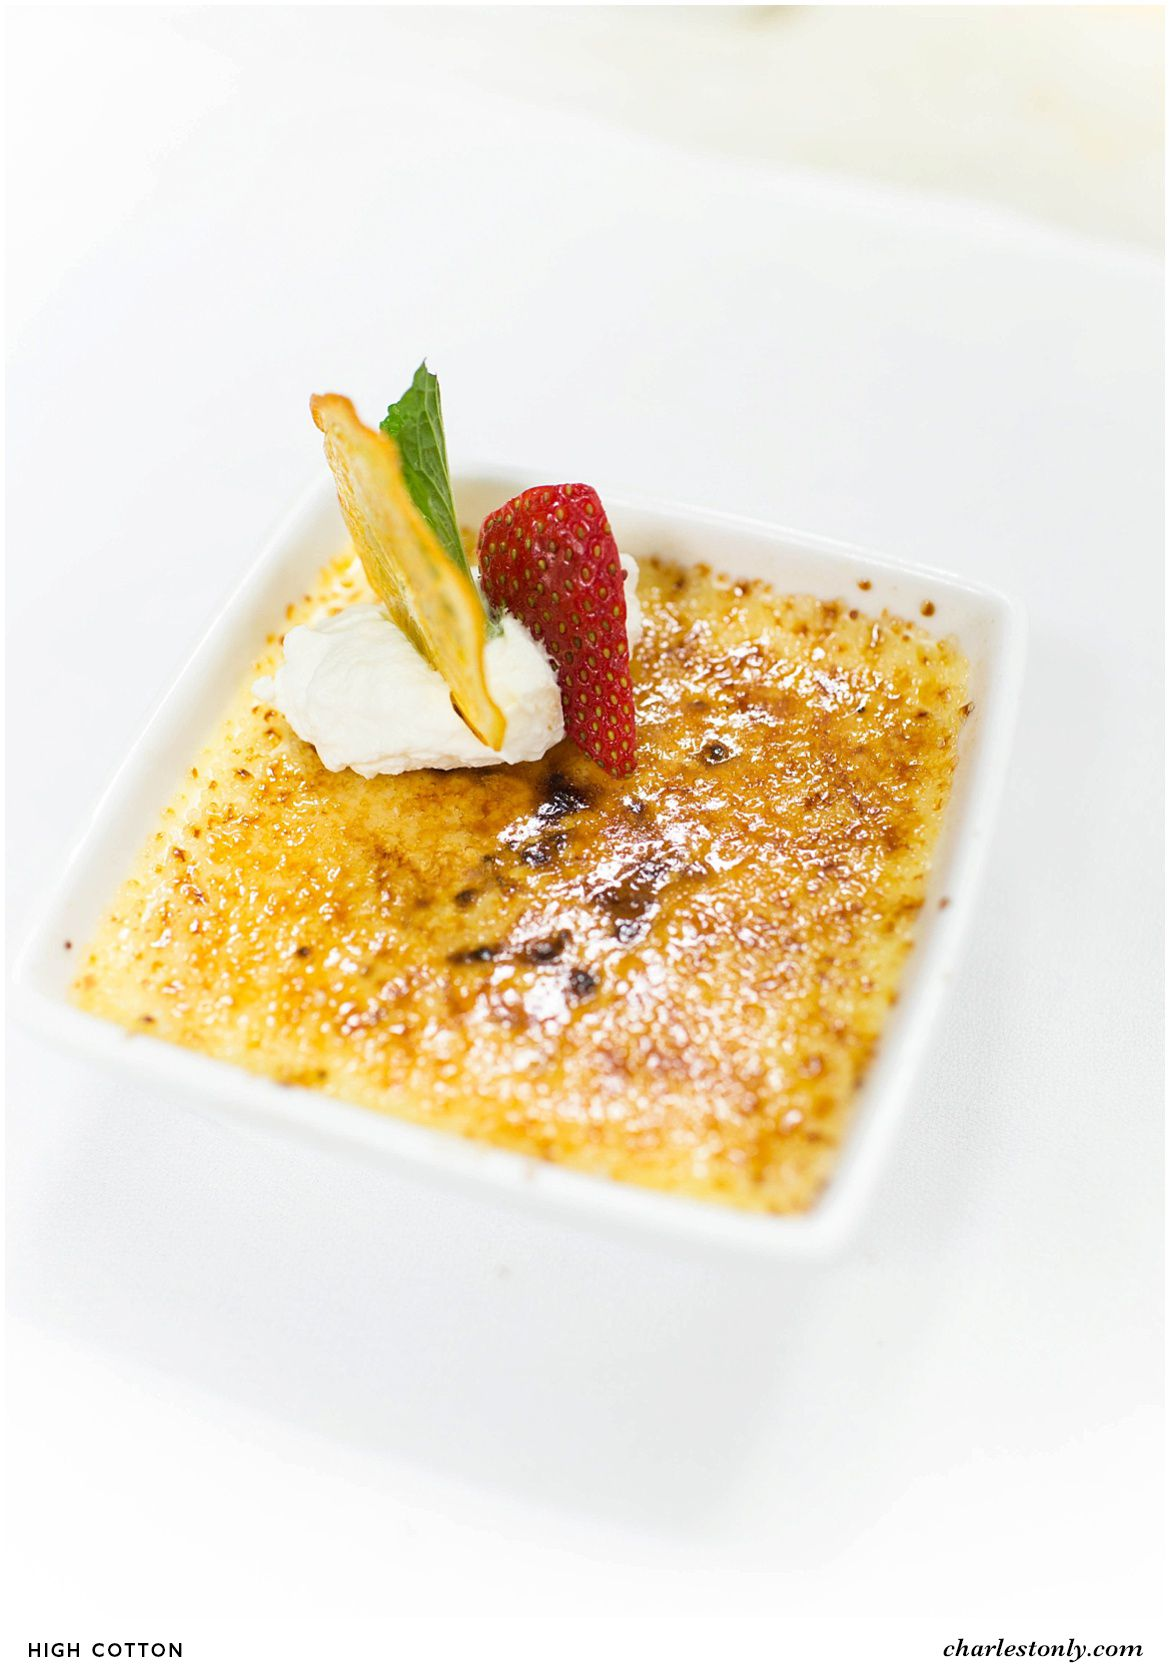 High Cotton | Charleston's Iconic Desserts | Charlestonly.com